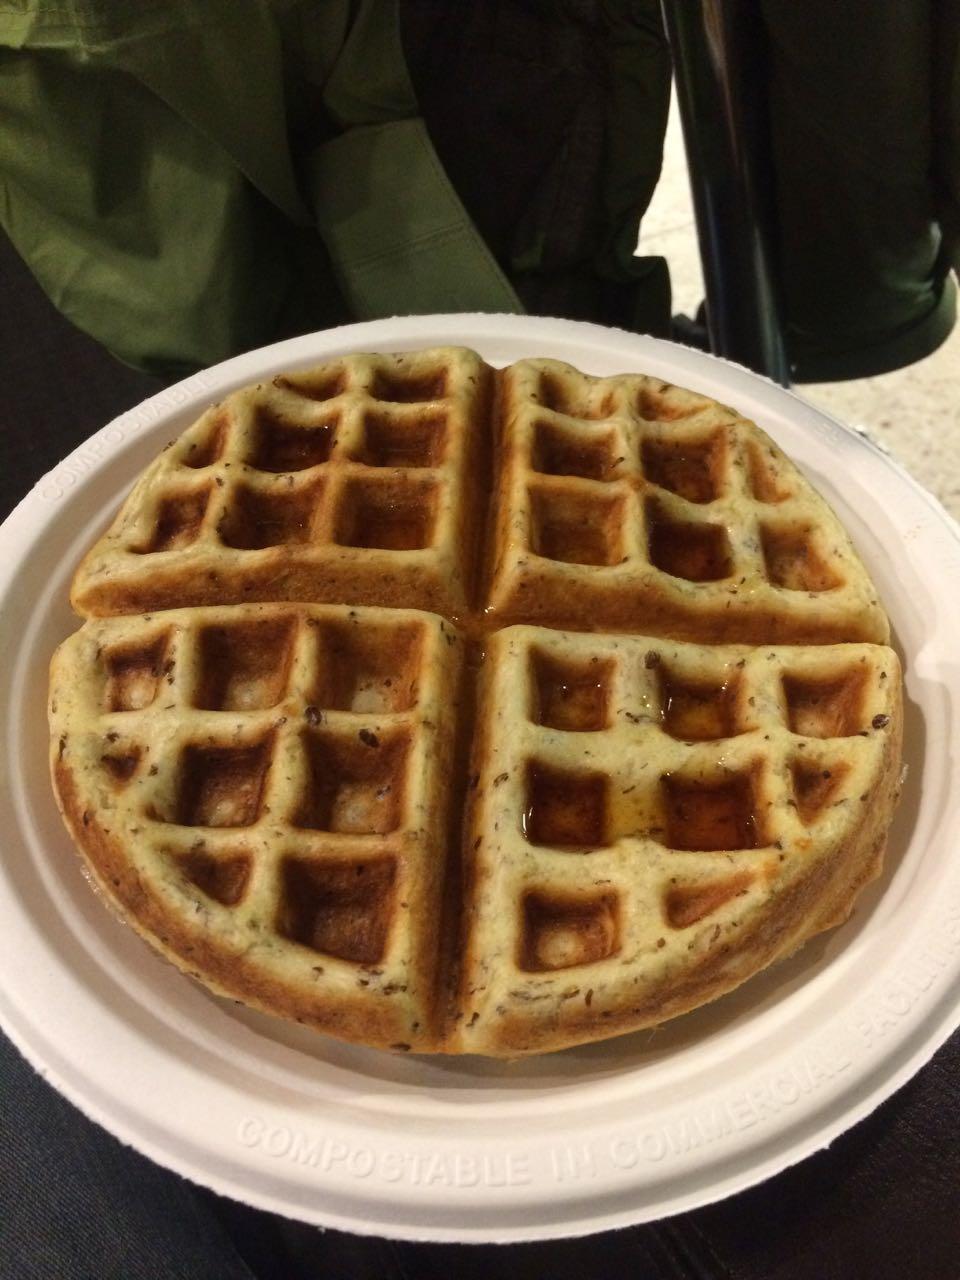 Mmm, vegan gluten-free waffle! - City Cakes, SLC